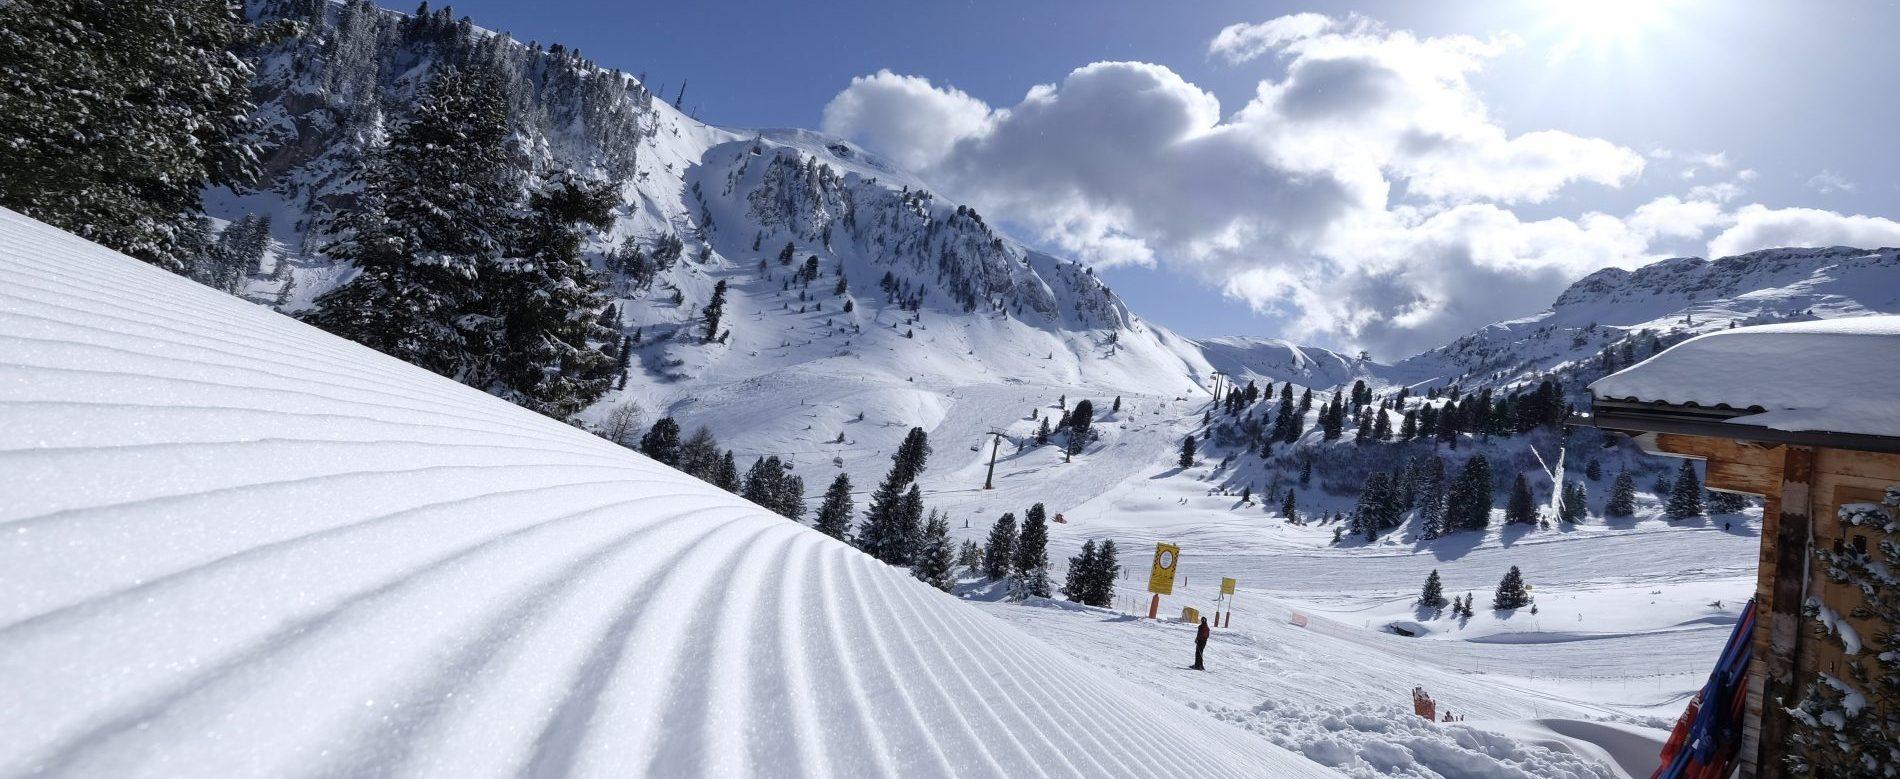 Ski and winter sports